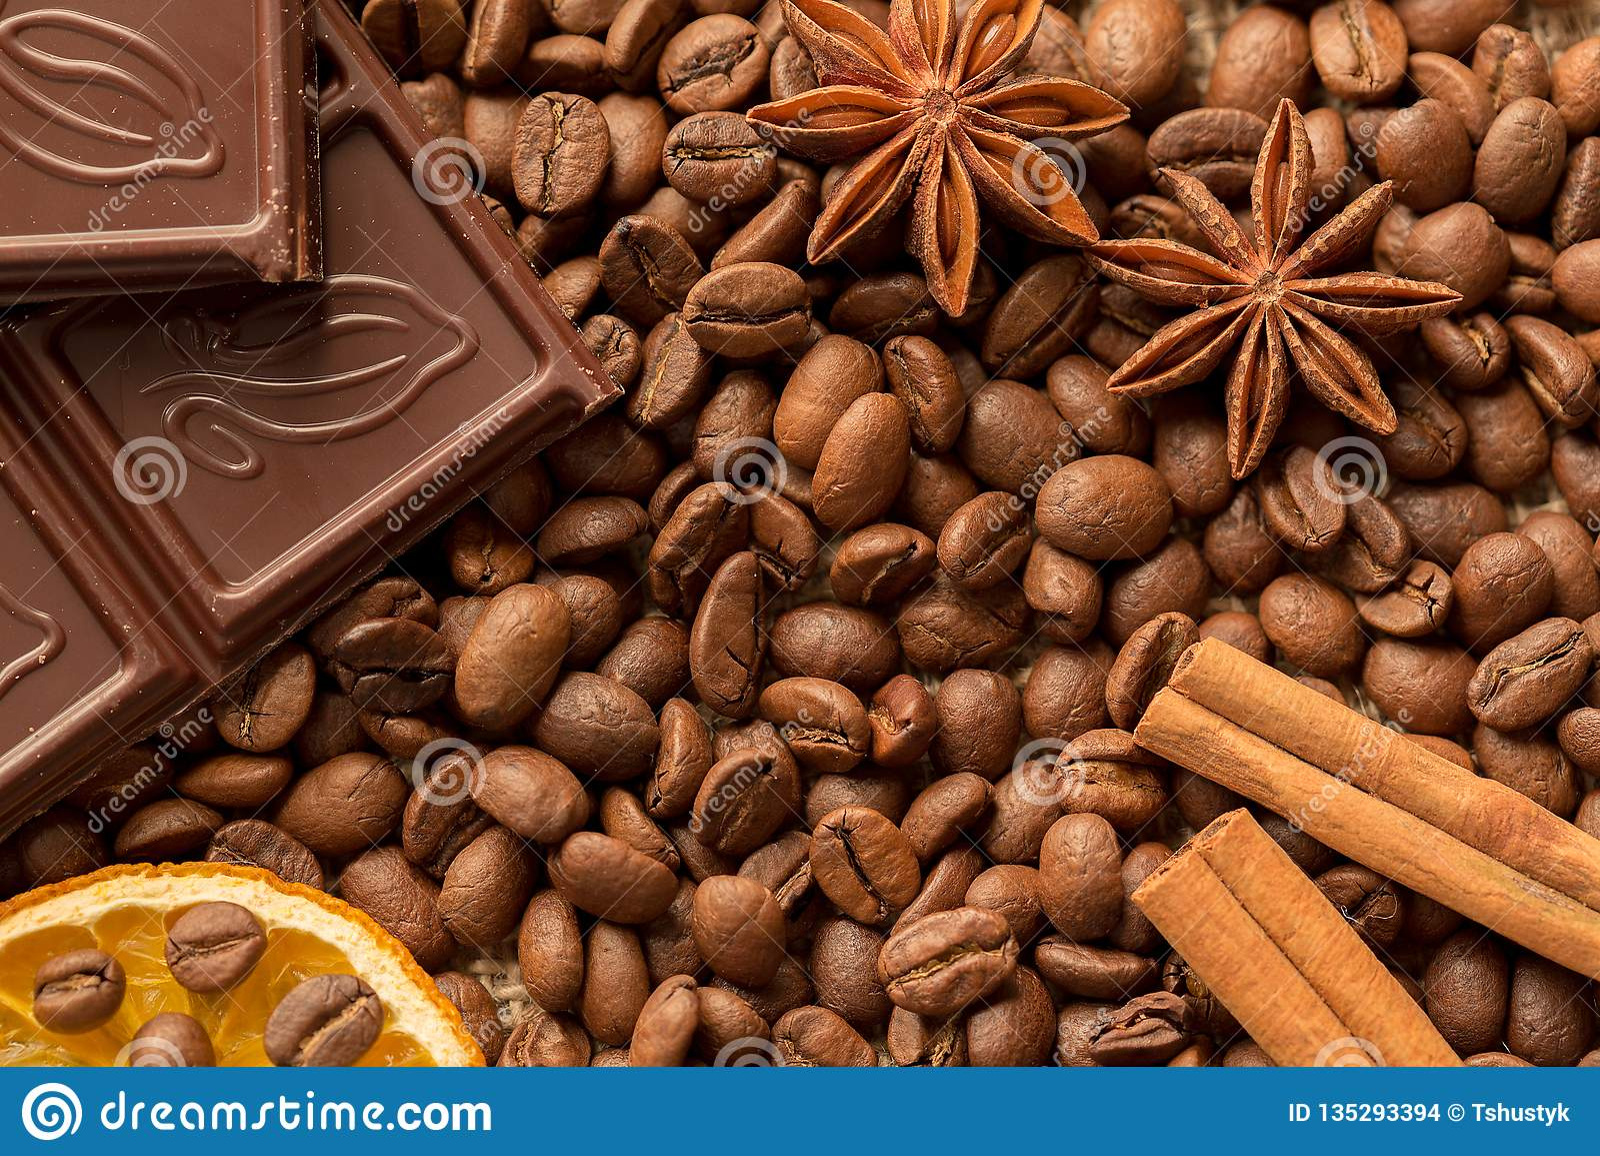 Brown ingredients macro: anise star, cinnamon sticks and coffee beans. Top view